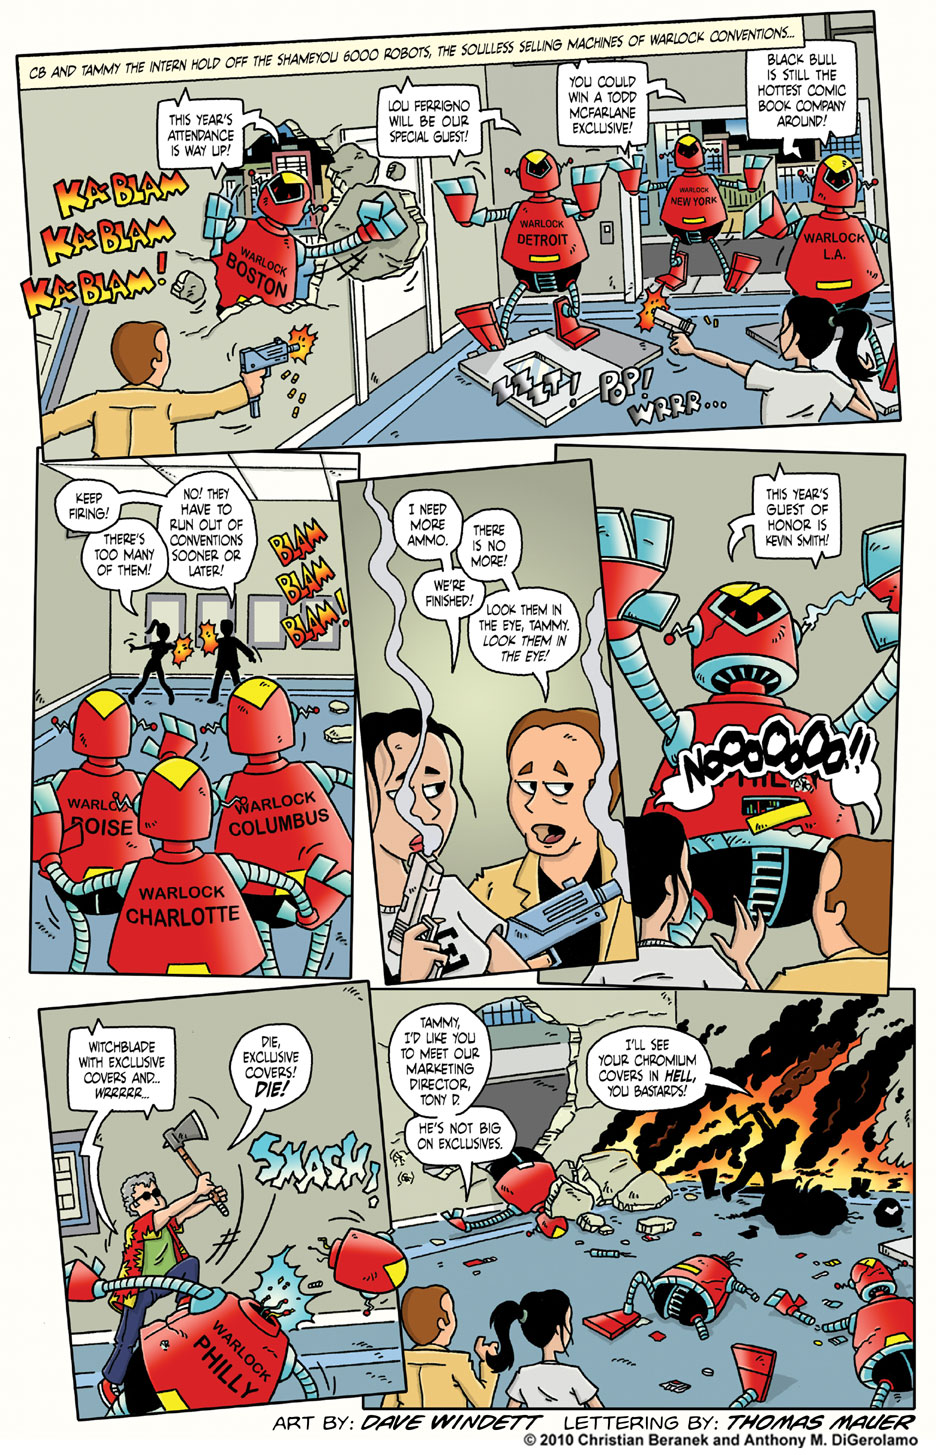 Comic Book Mafia #5: See You at Warlock!